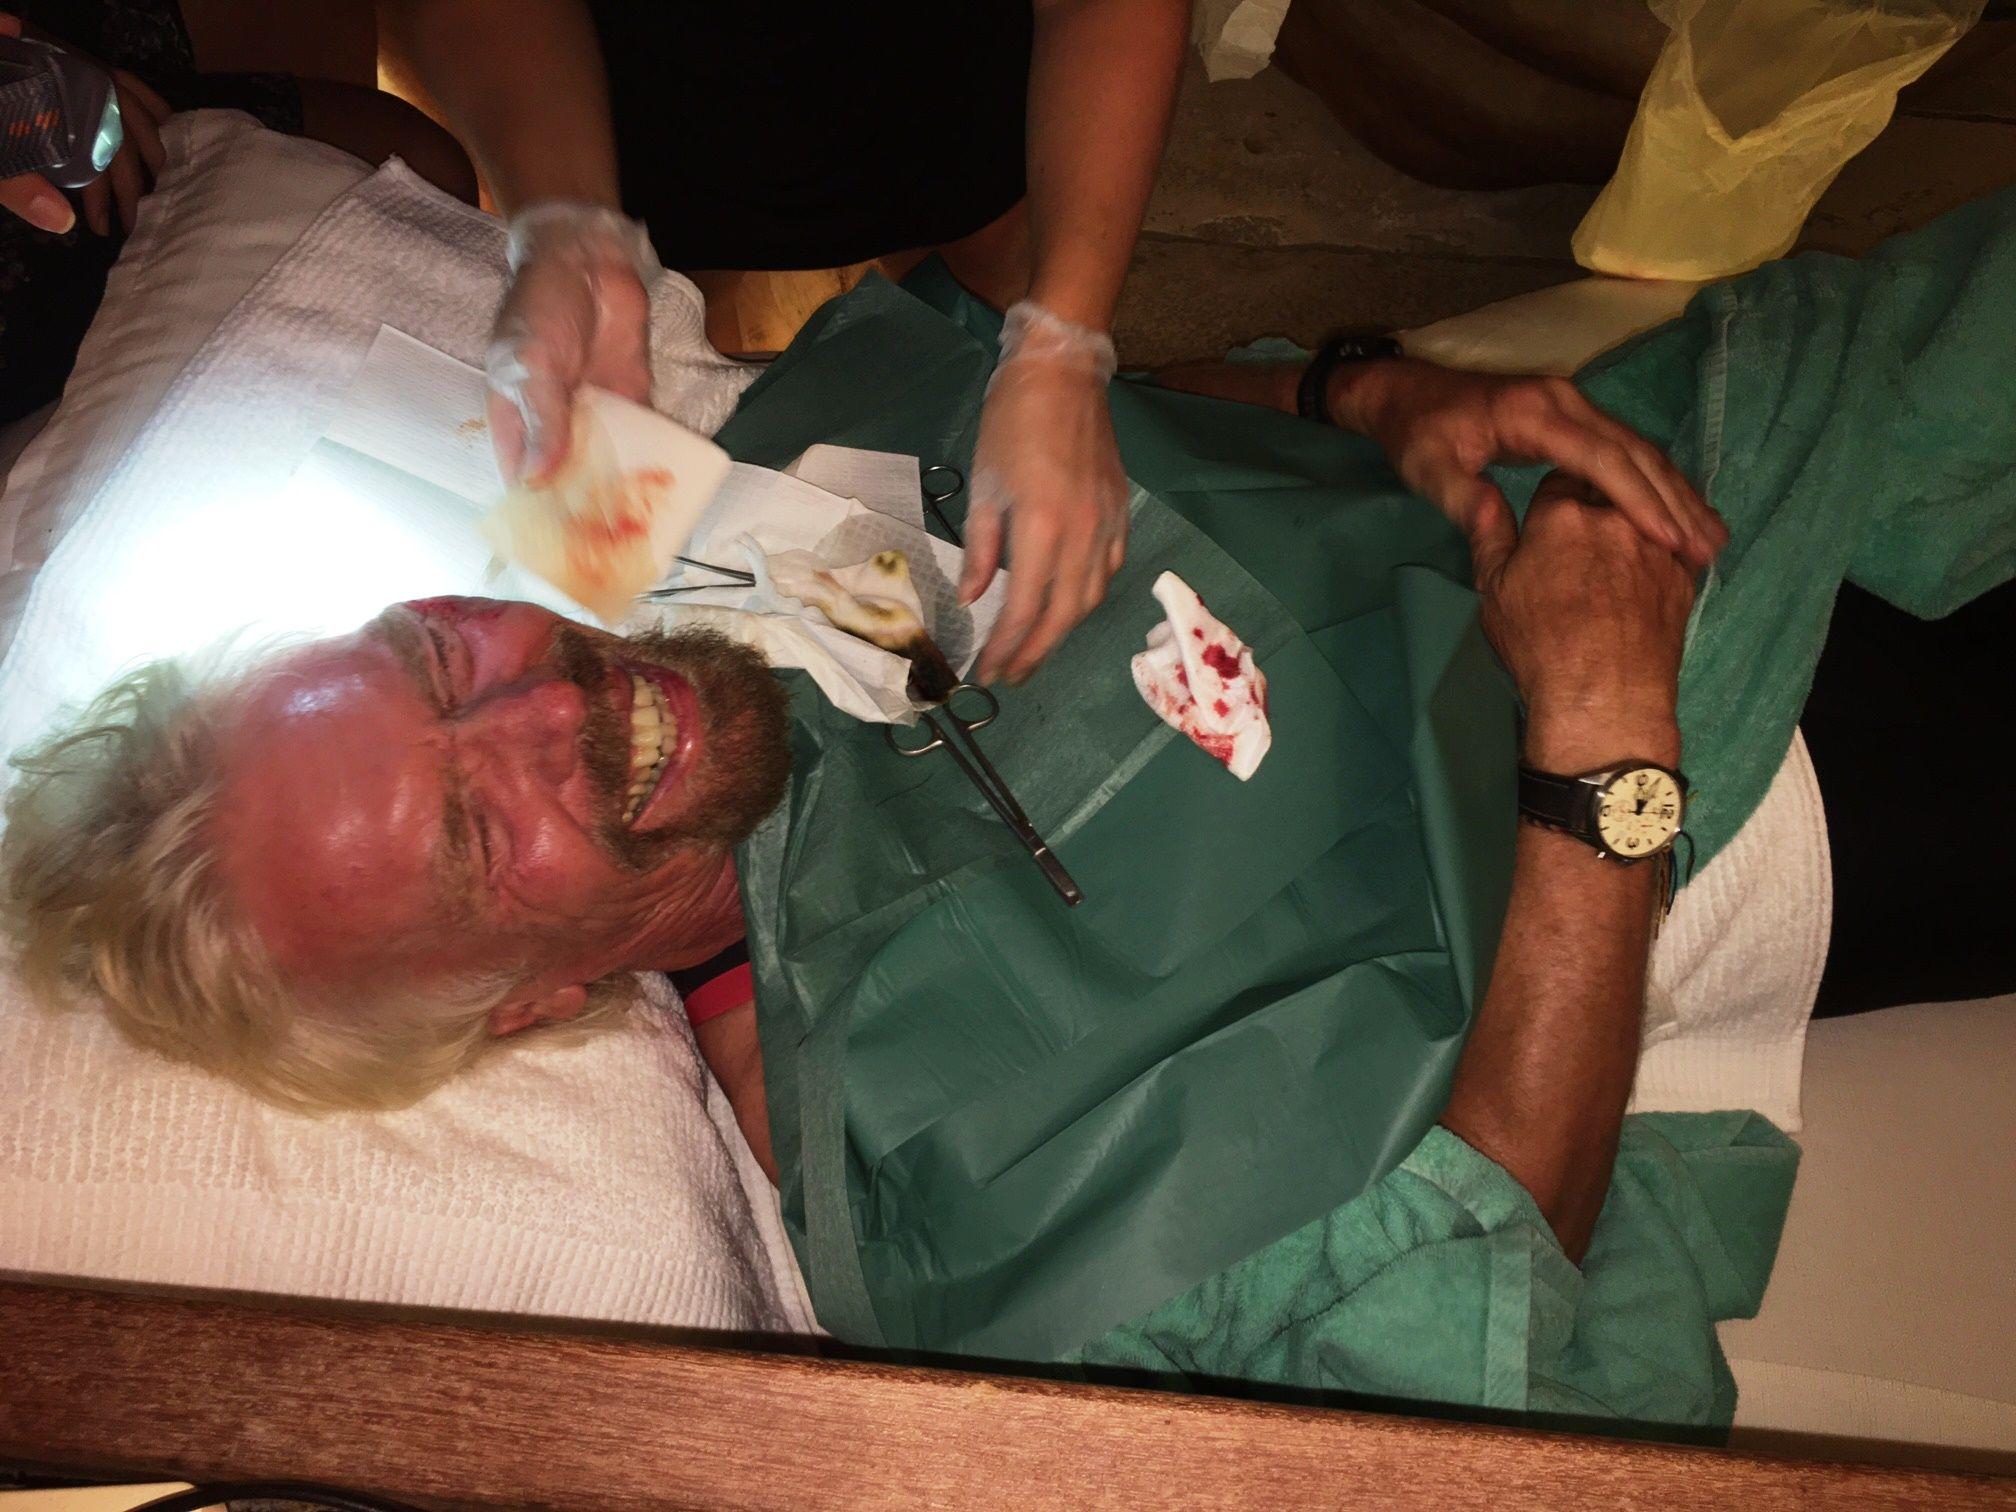 Richard Branson bike crash injury stitches